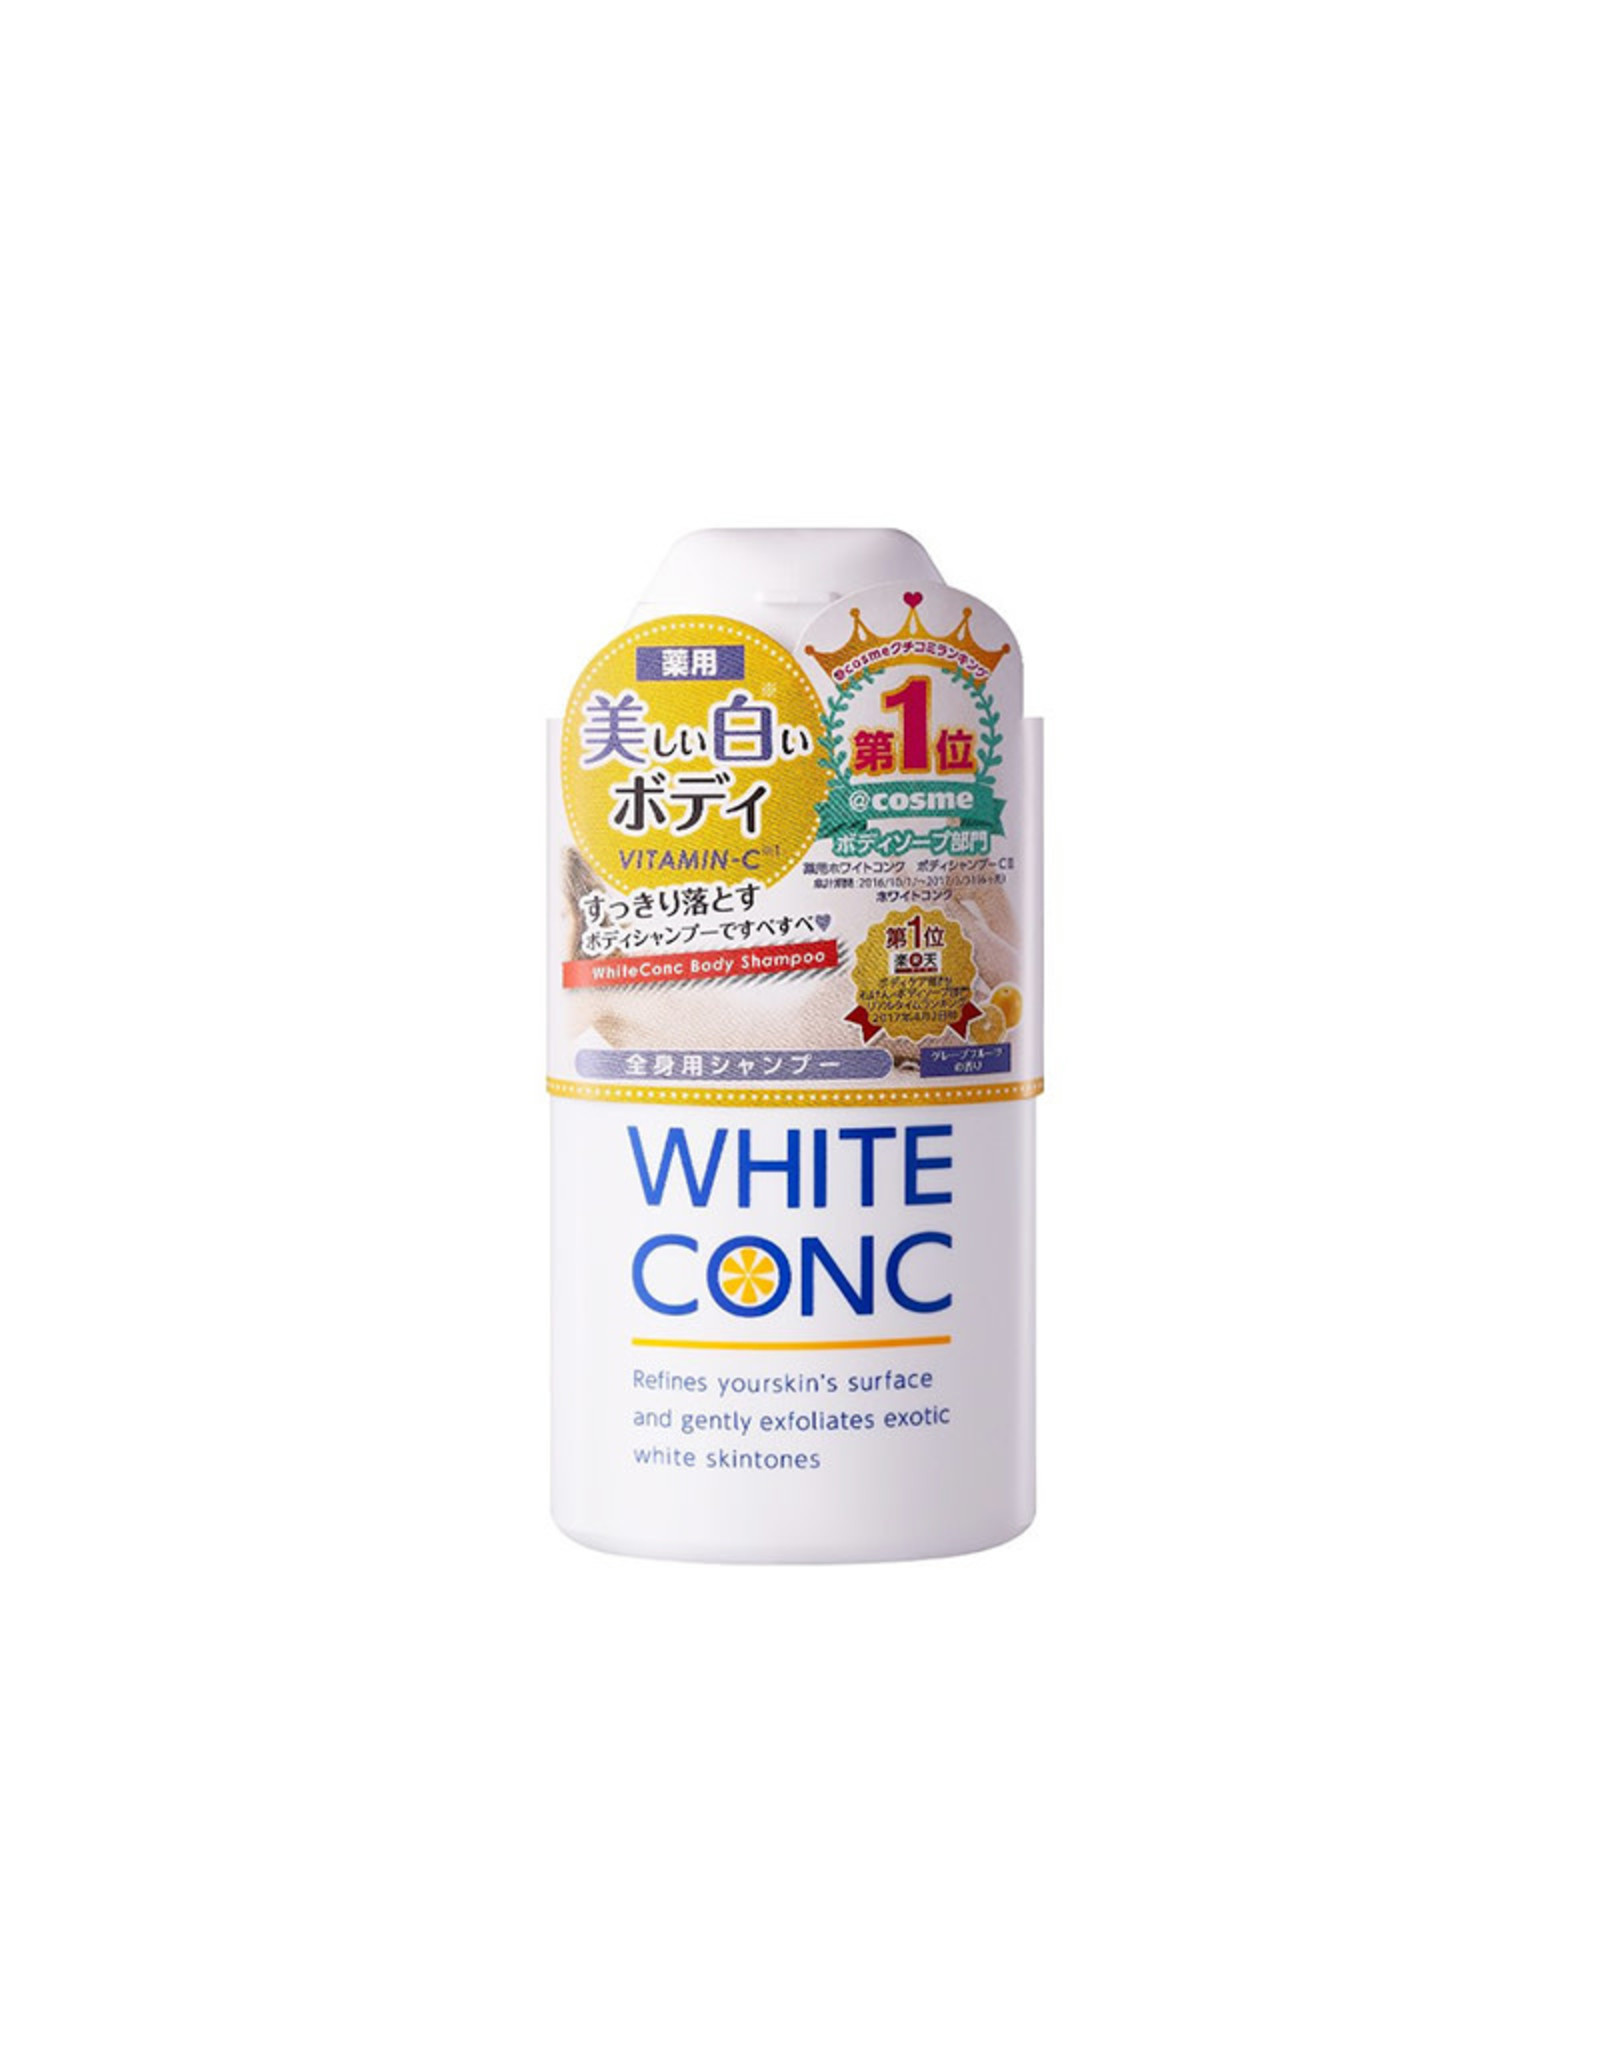 White Conc White Conc Body Shampoo CII 150ml